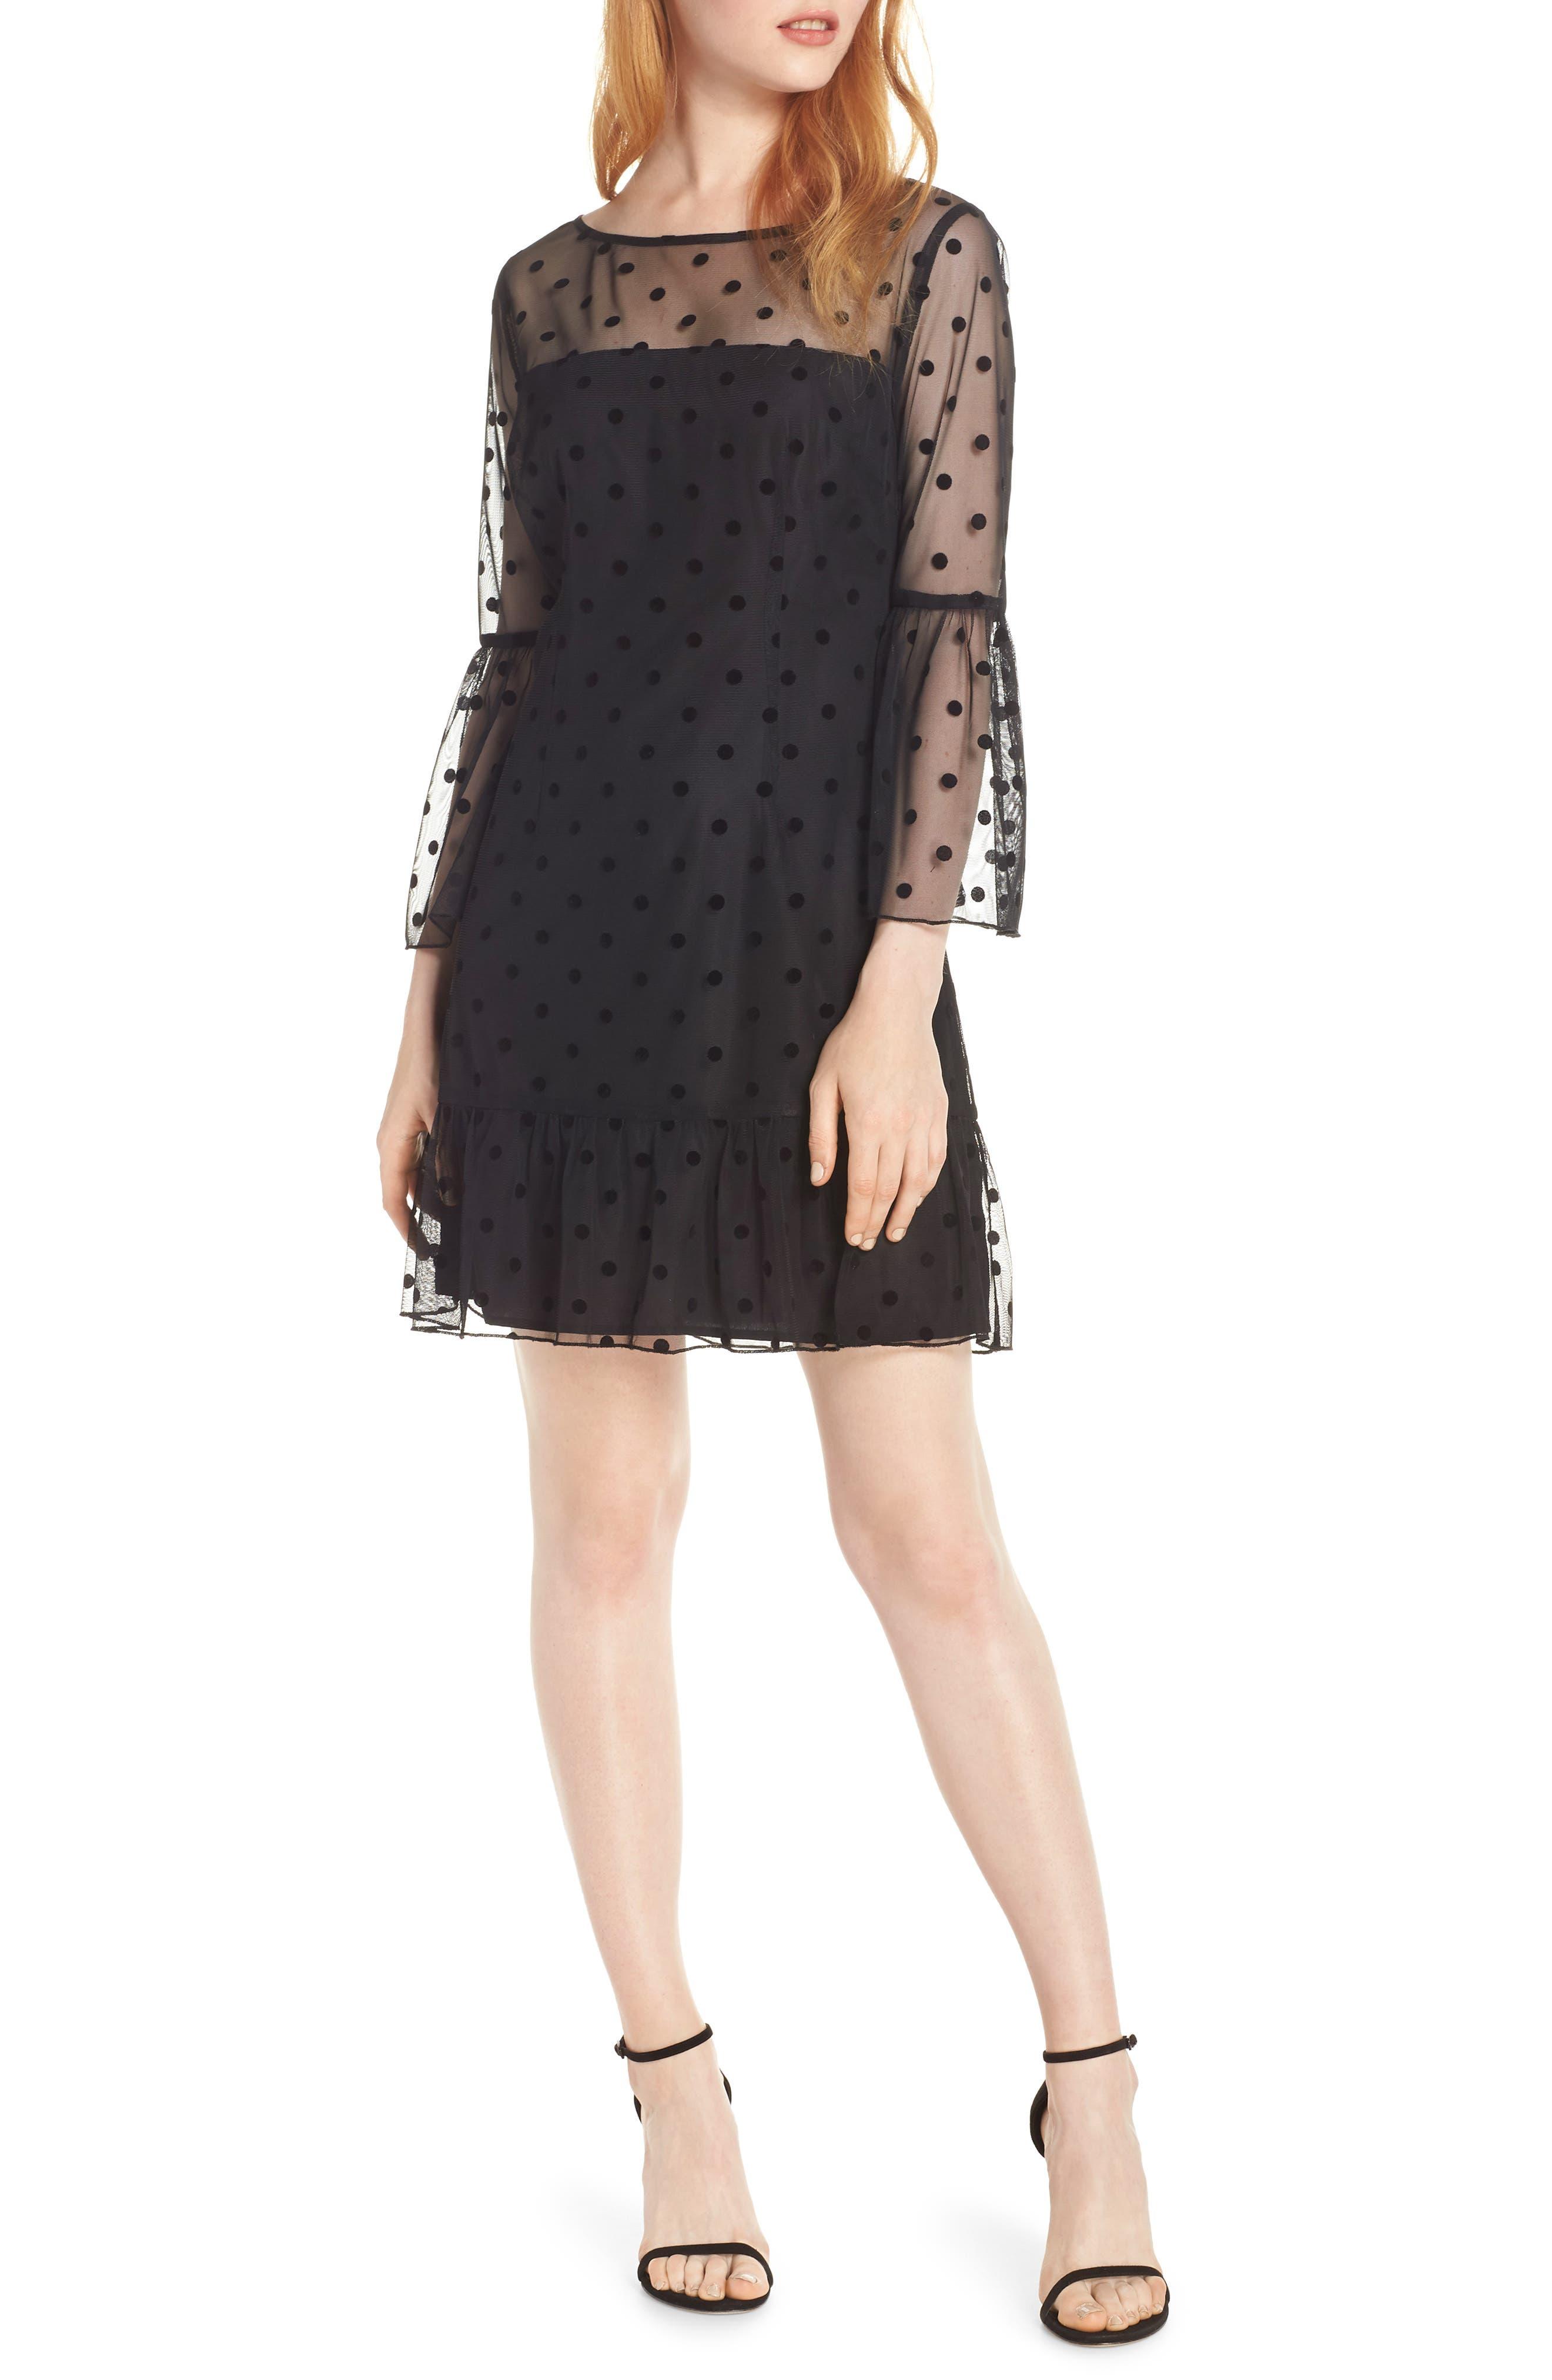 Bb Dakota Swiss Dot Dress, Black